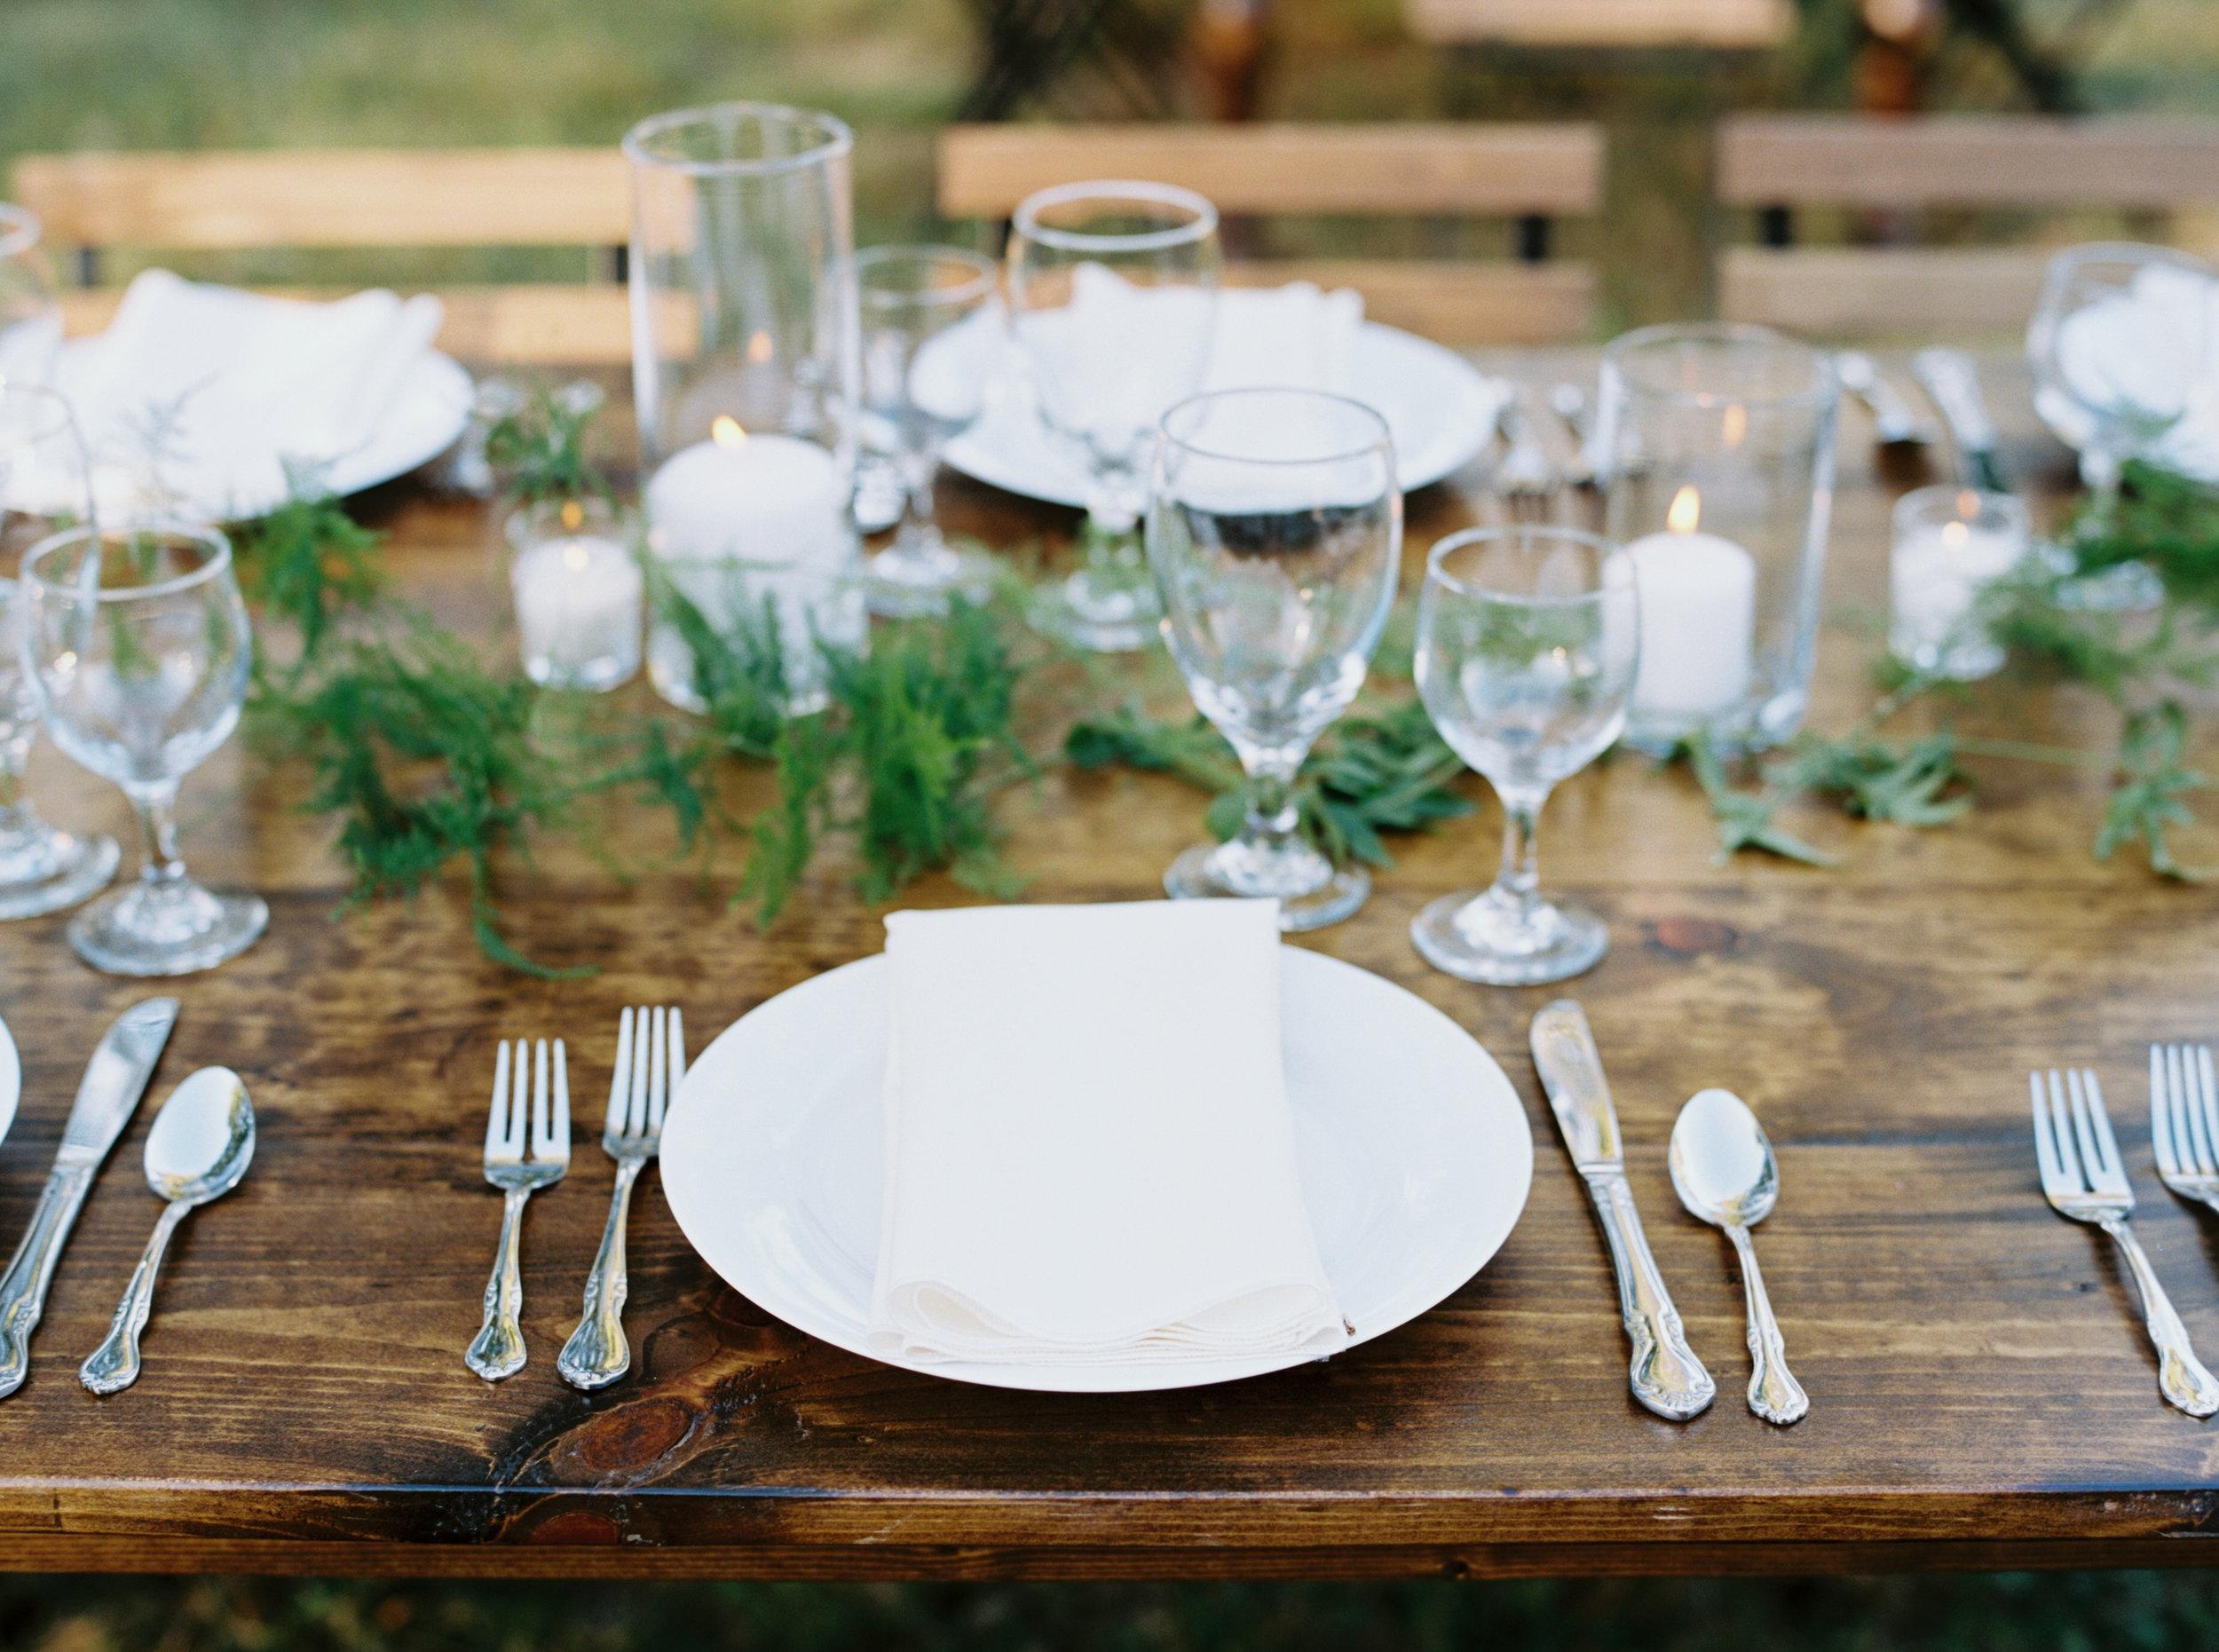 Fall Bloomsbury Farm Wedding - Nashville, TN - Farm Tables